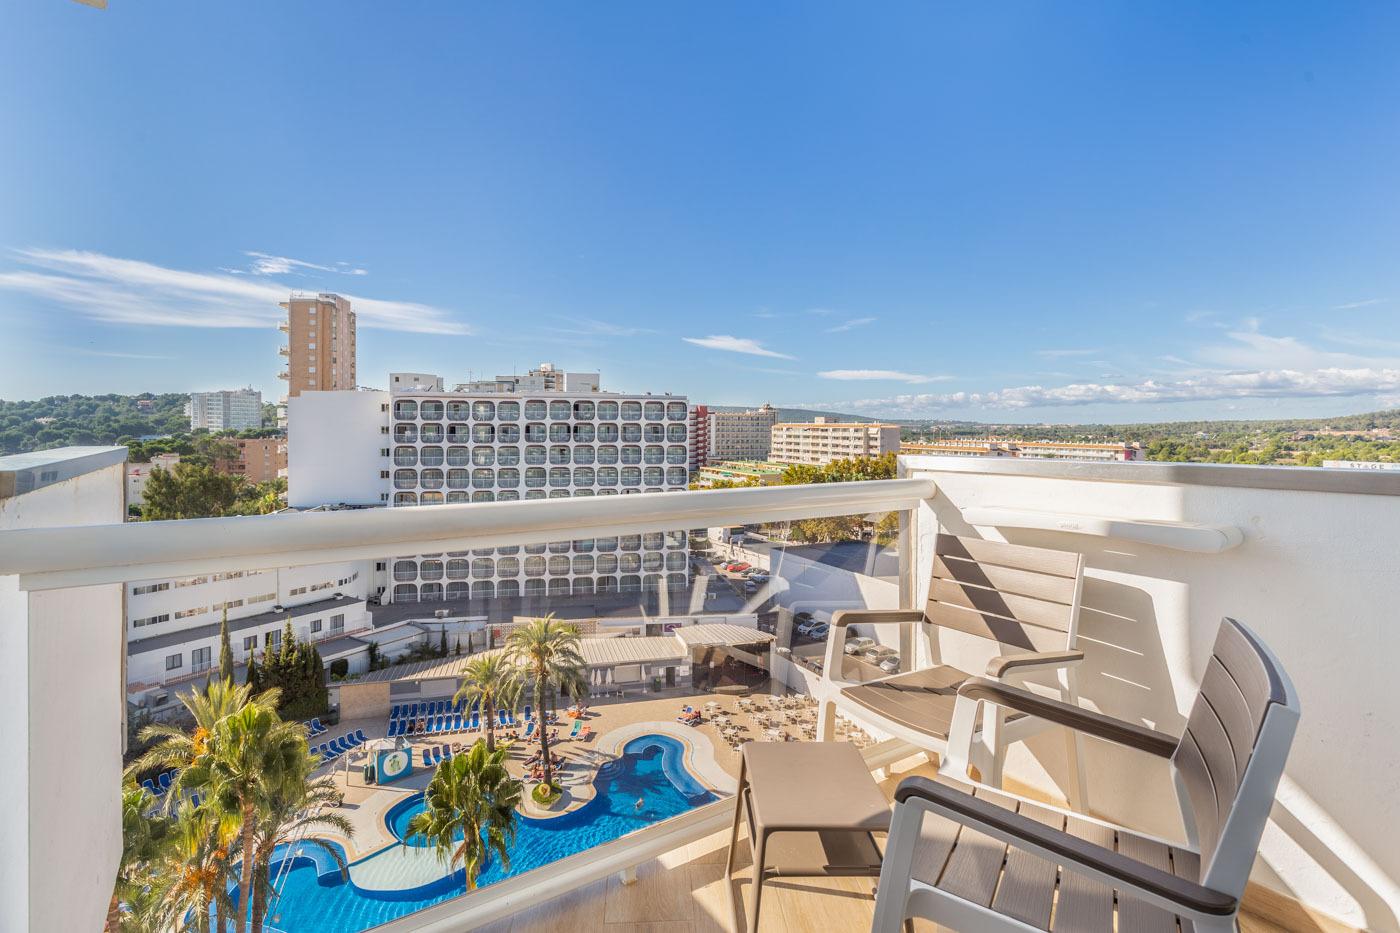 Standard pool view